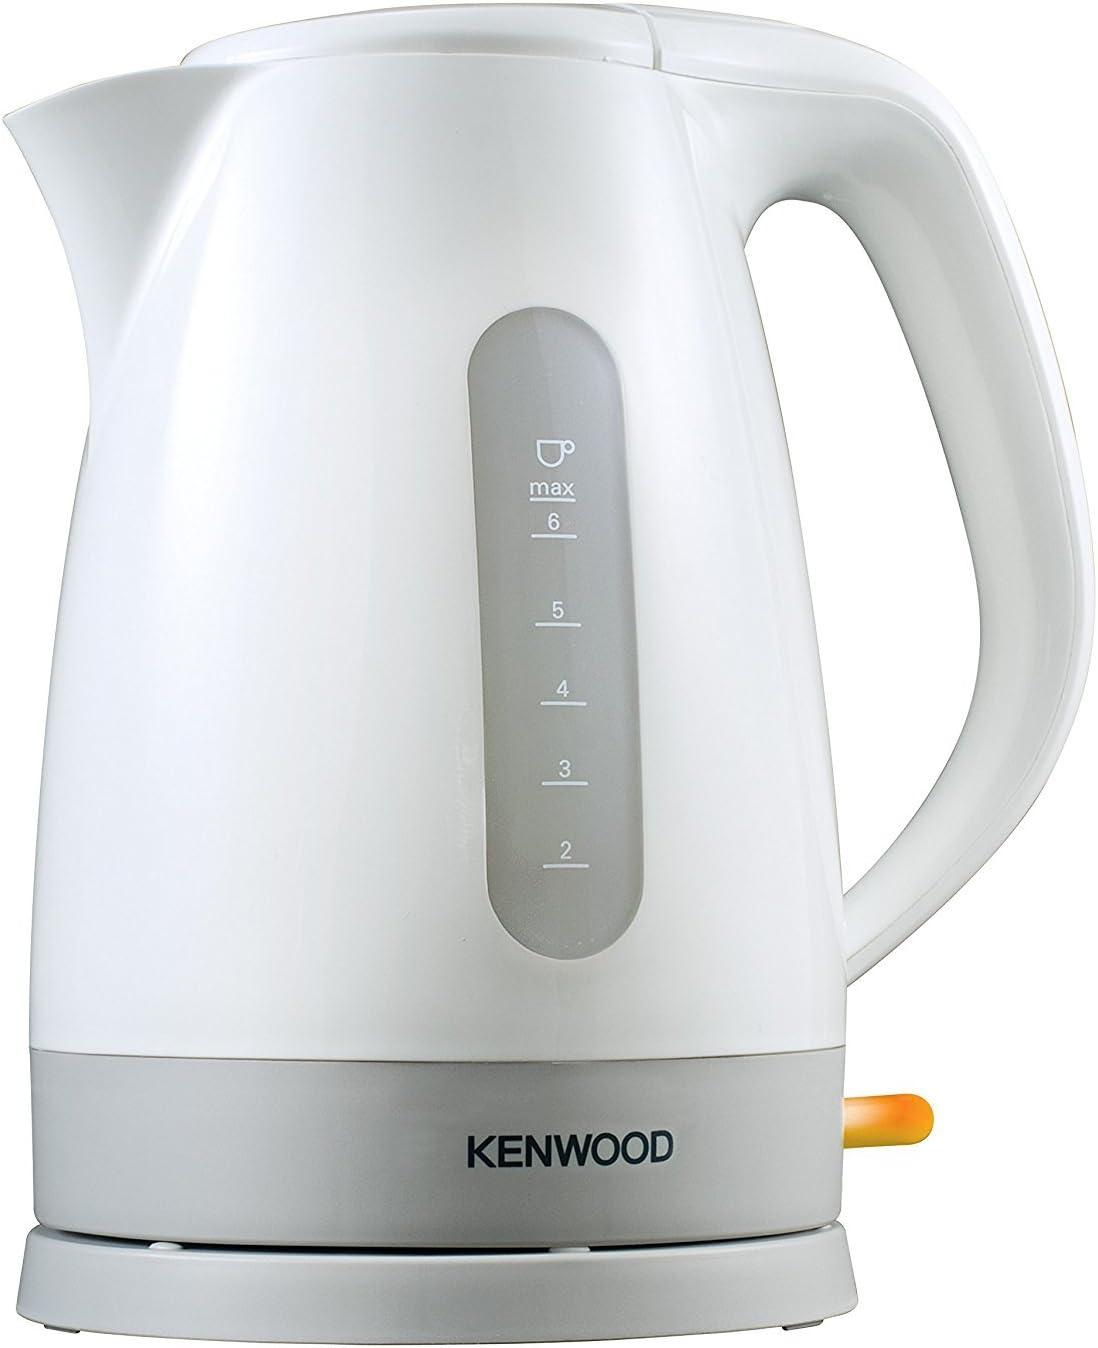 Kenwood Cordless Jug Kettle with 3KW